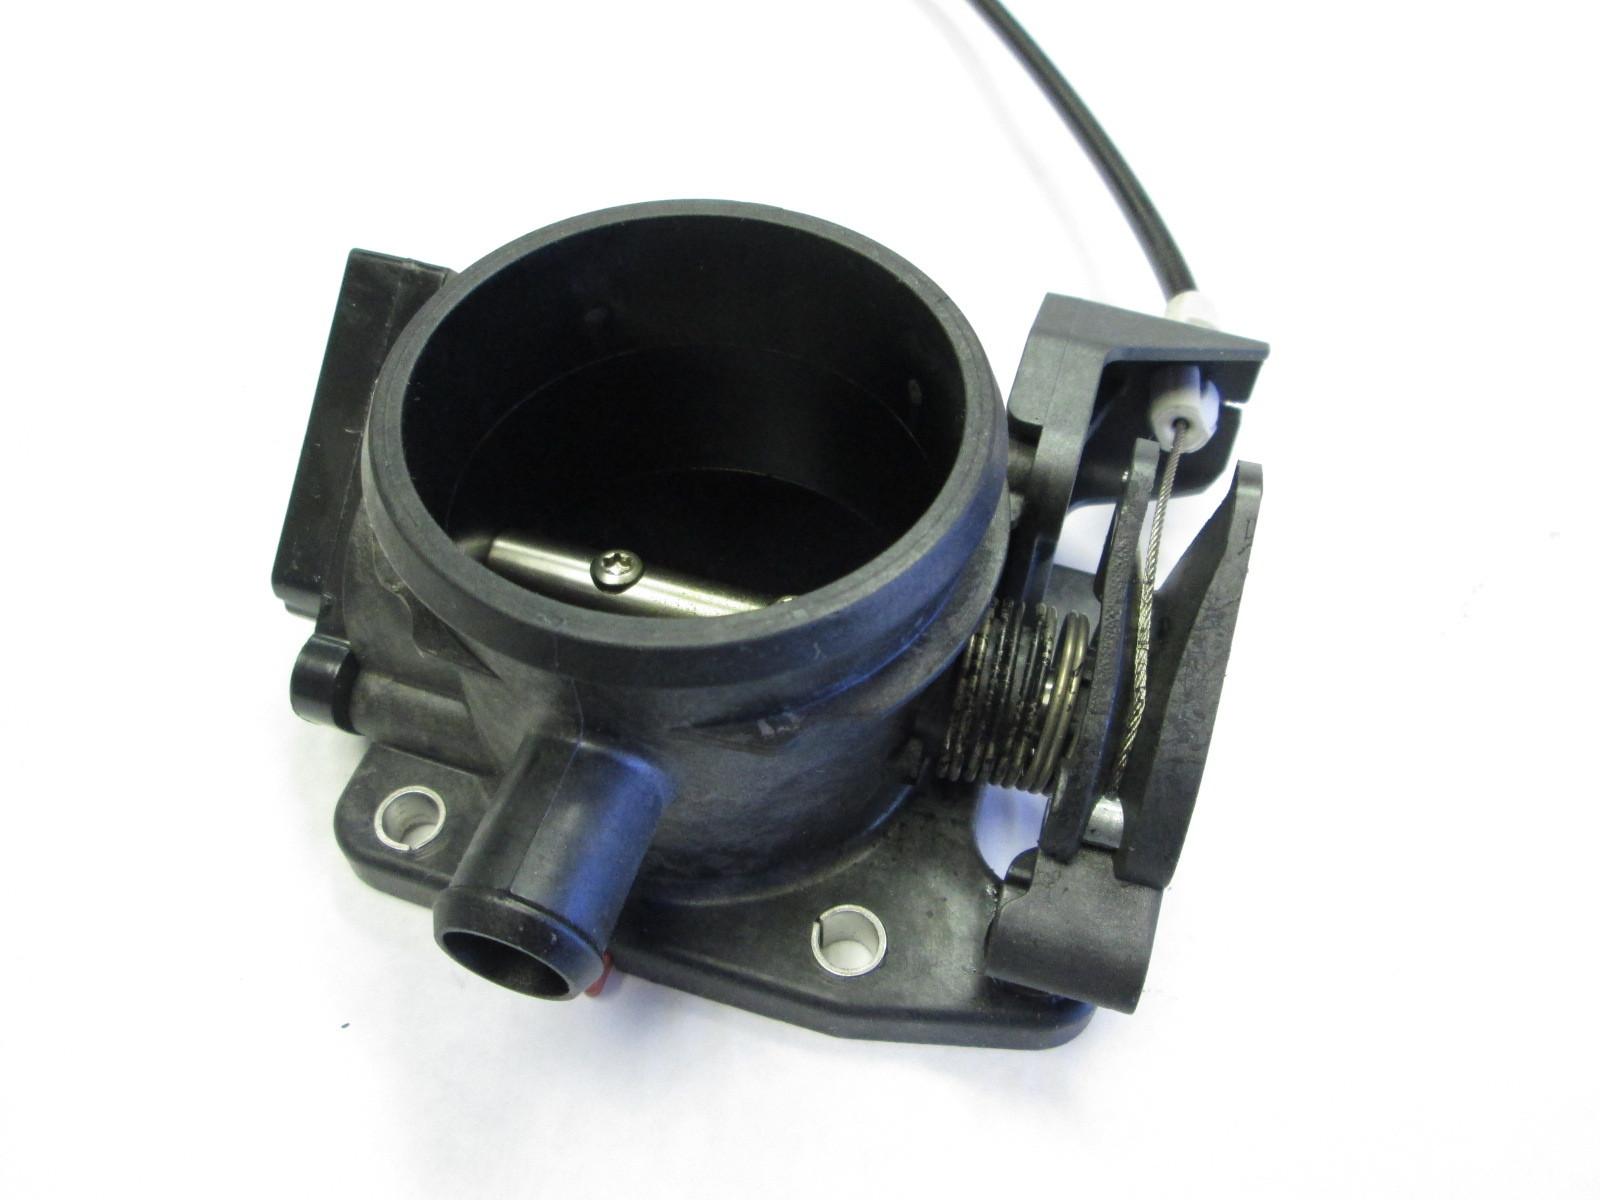 2013 mercury 115 Hp Outboard Motor troubleshooting 50 hp